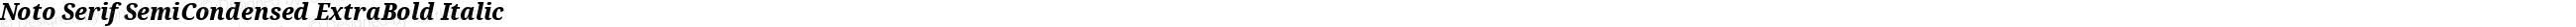 Noto Serif SemiCondensed ExtraBold Italic